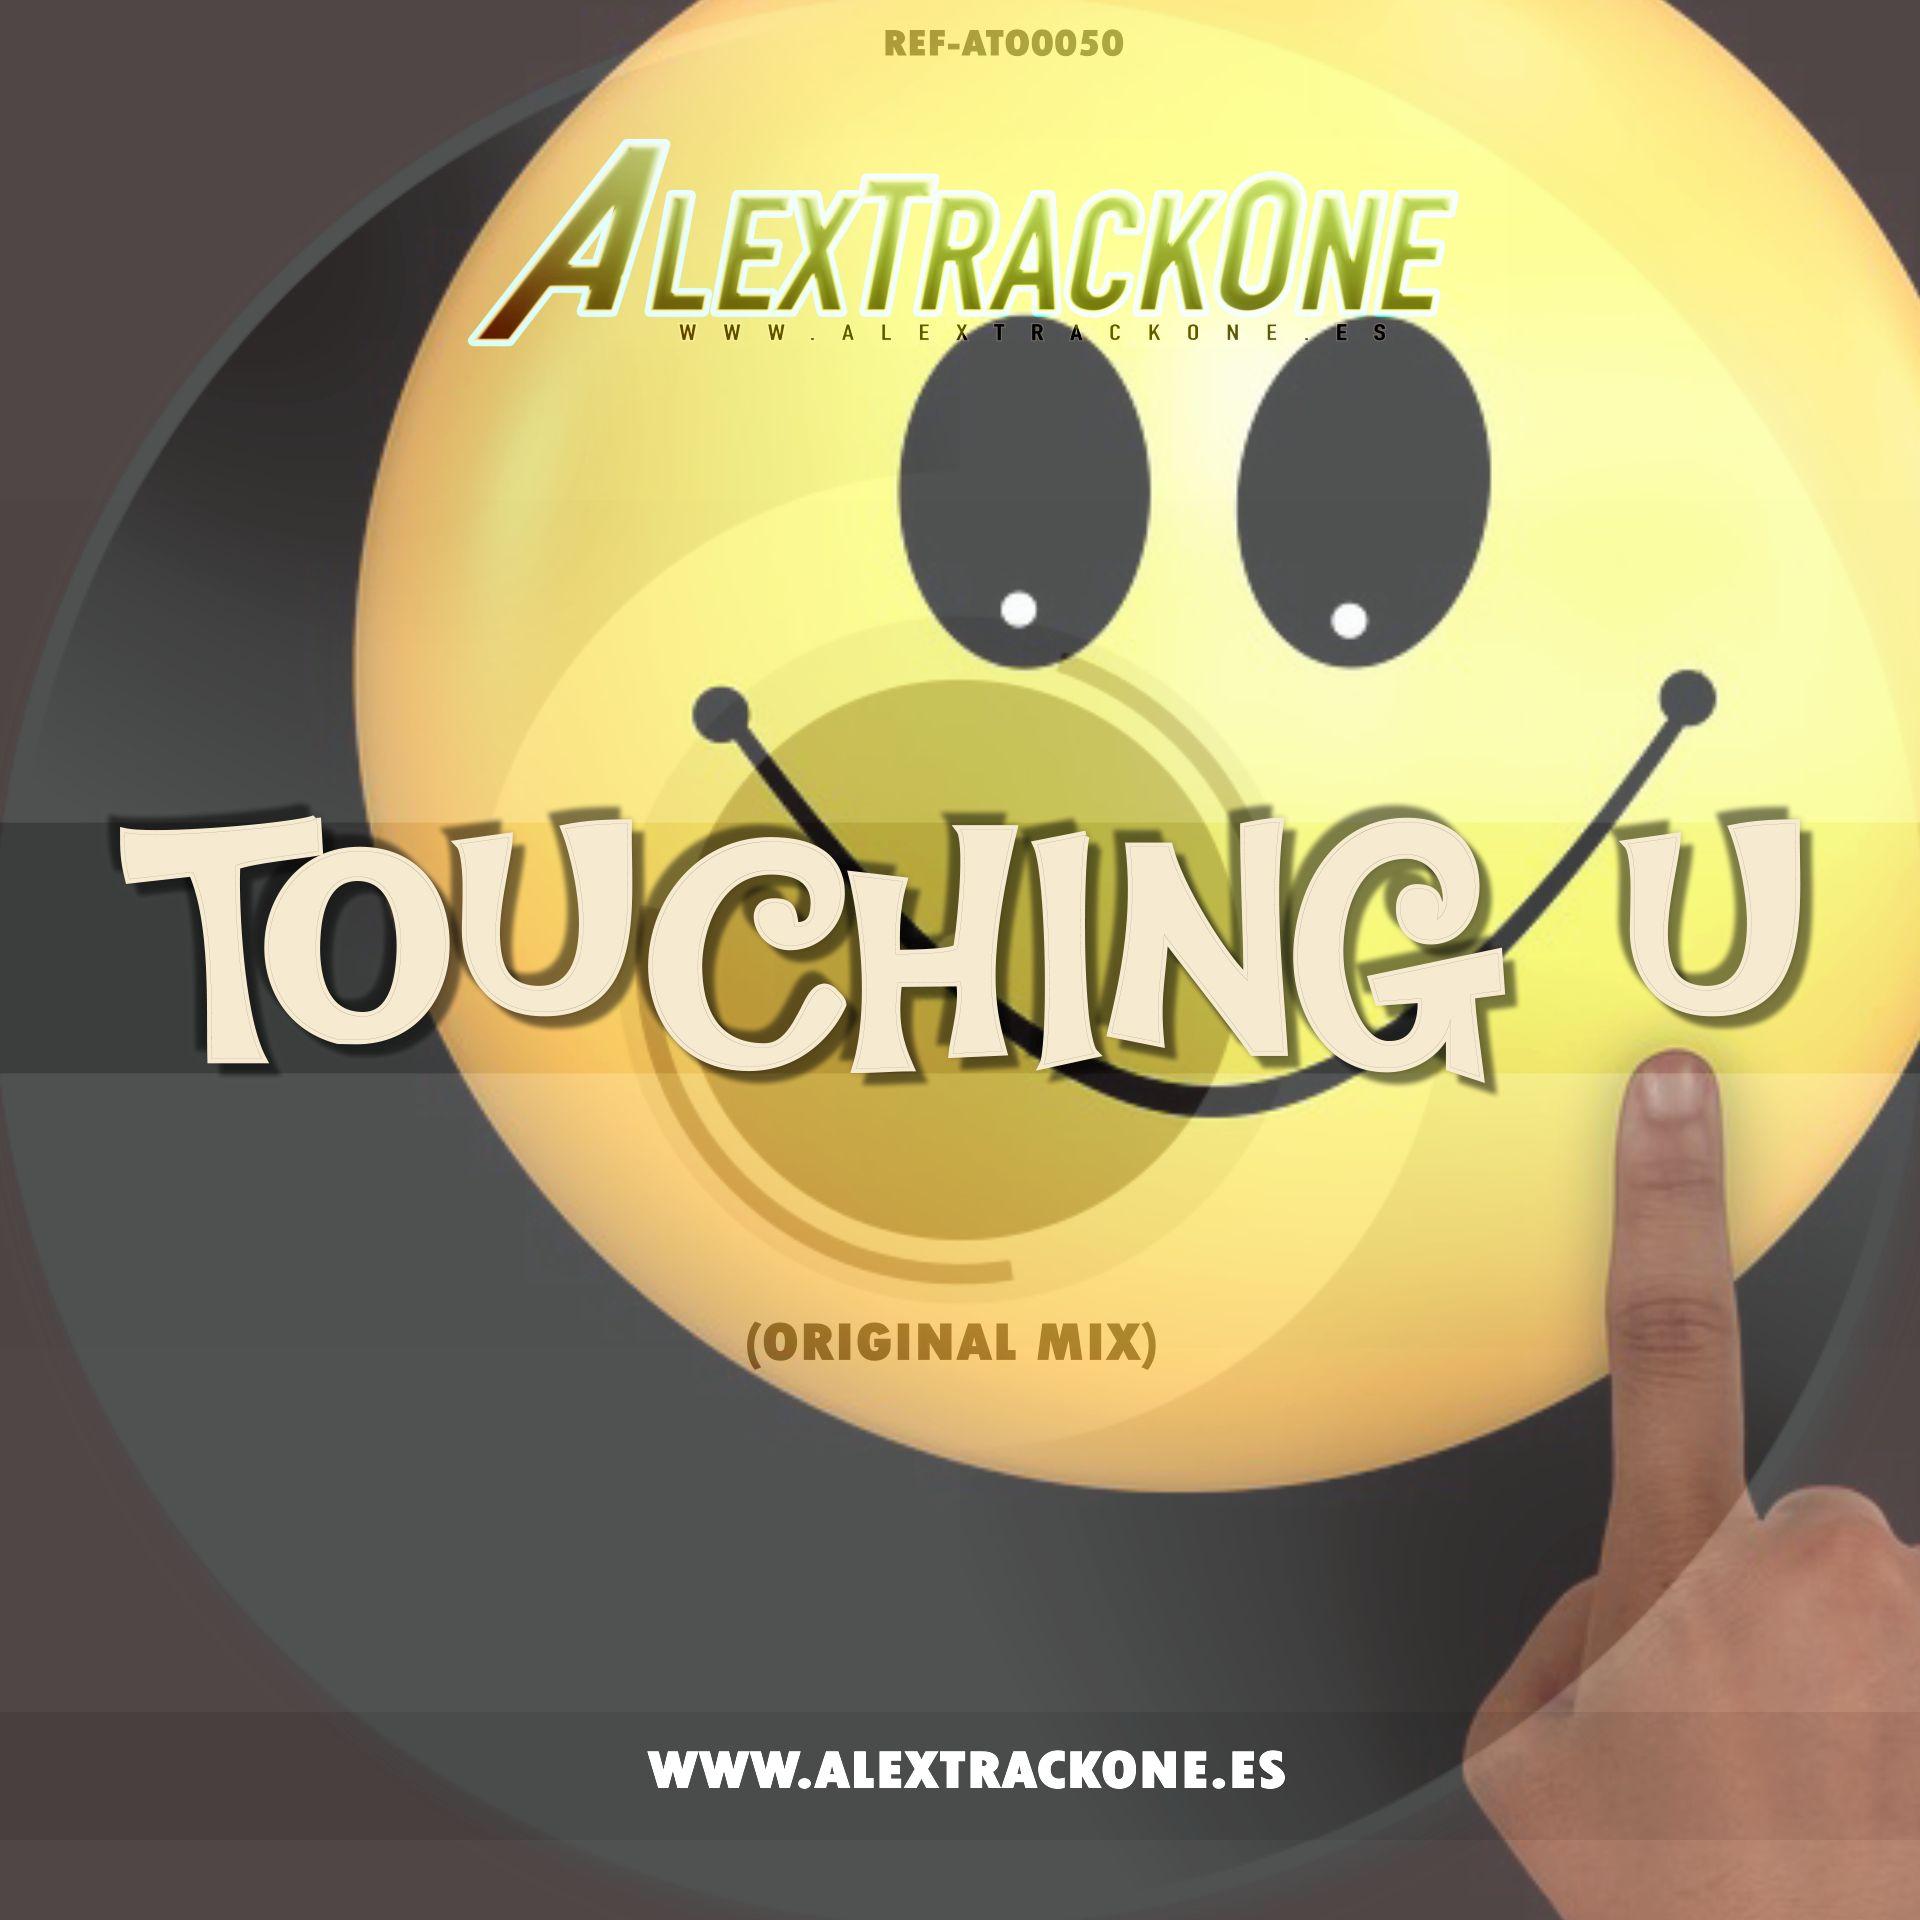 REF-ATO0050 TOUCHING YOU (ORIGINAL MIX) (MP3 & WAV)